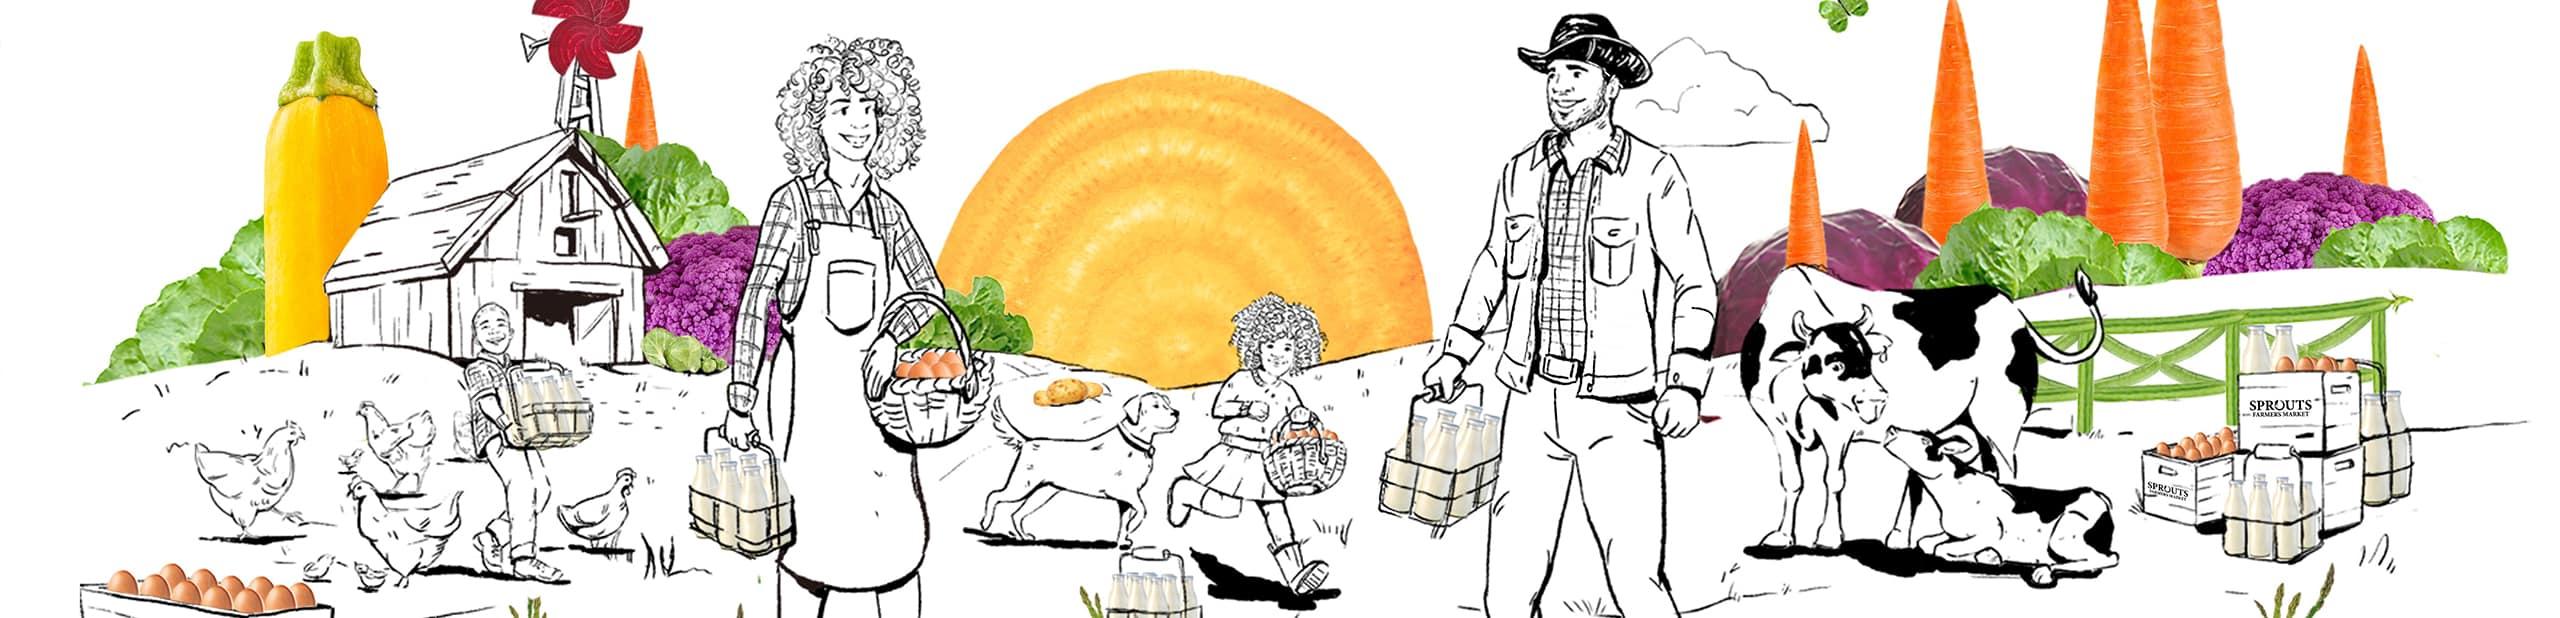 Dairy Scene Illustration